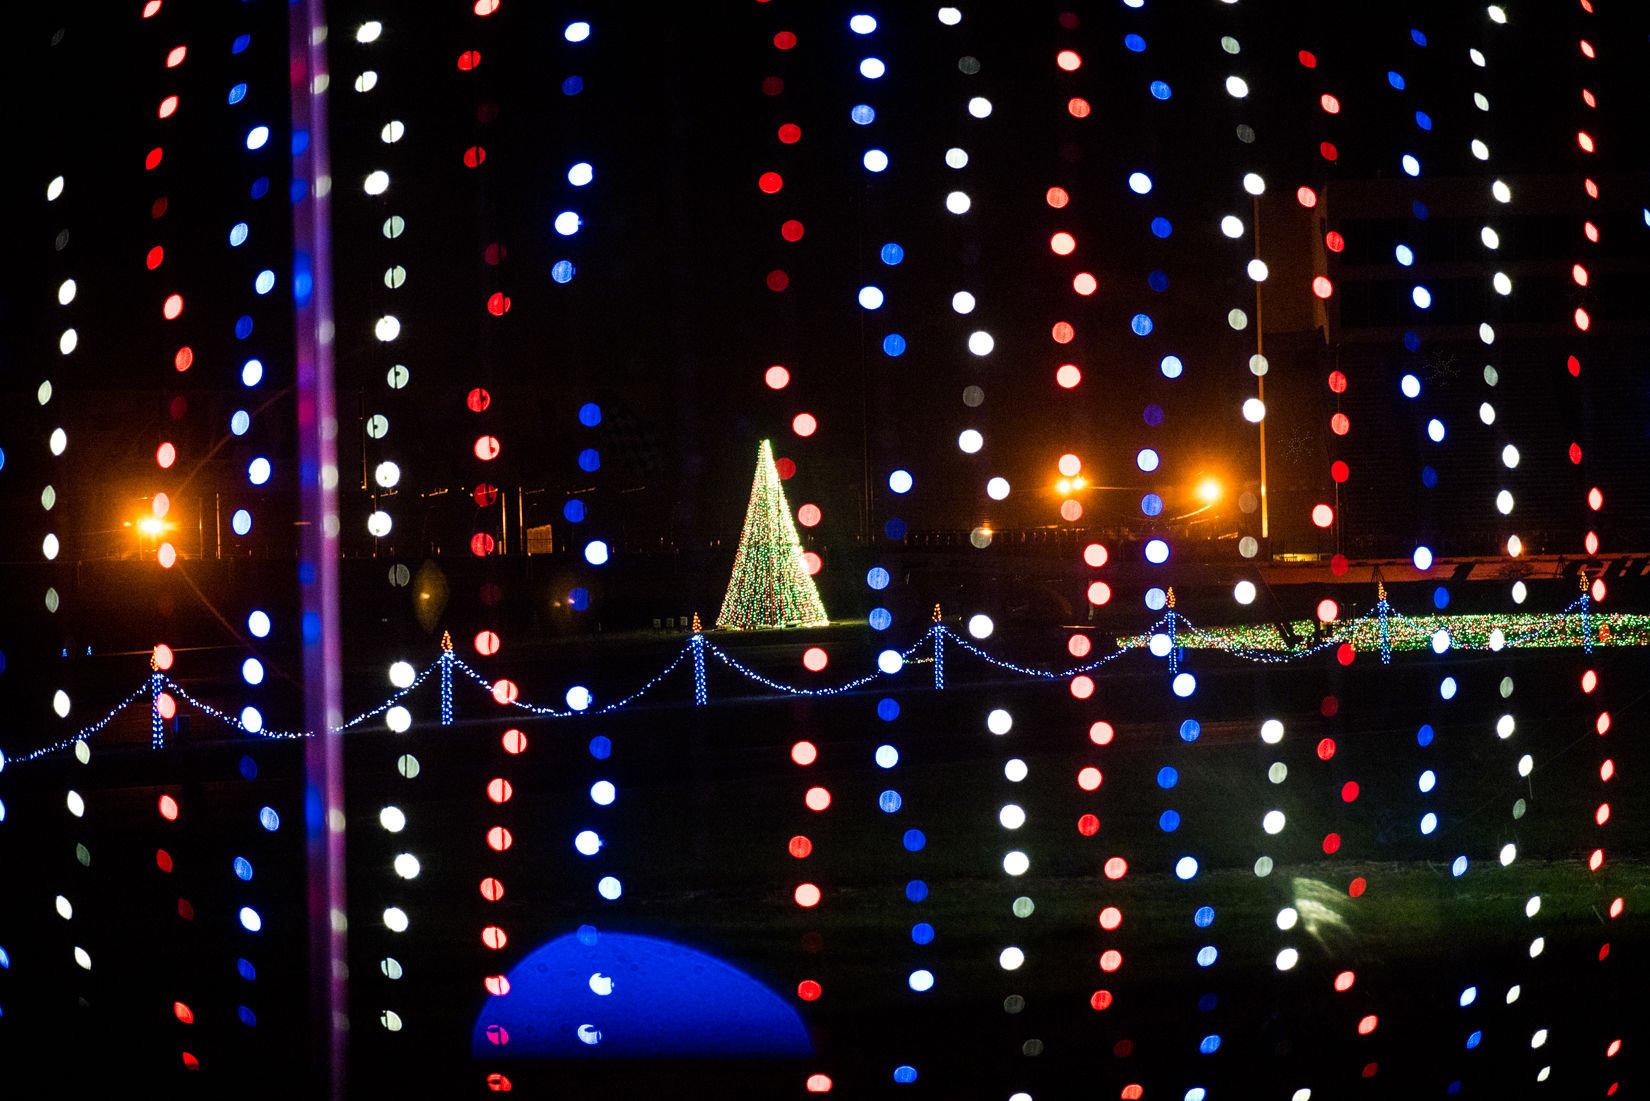 Charlotte Motor Speedway Christmas lights display kicks off ...